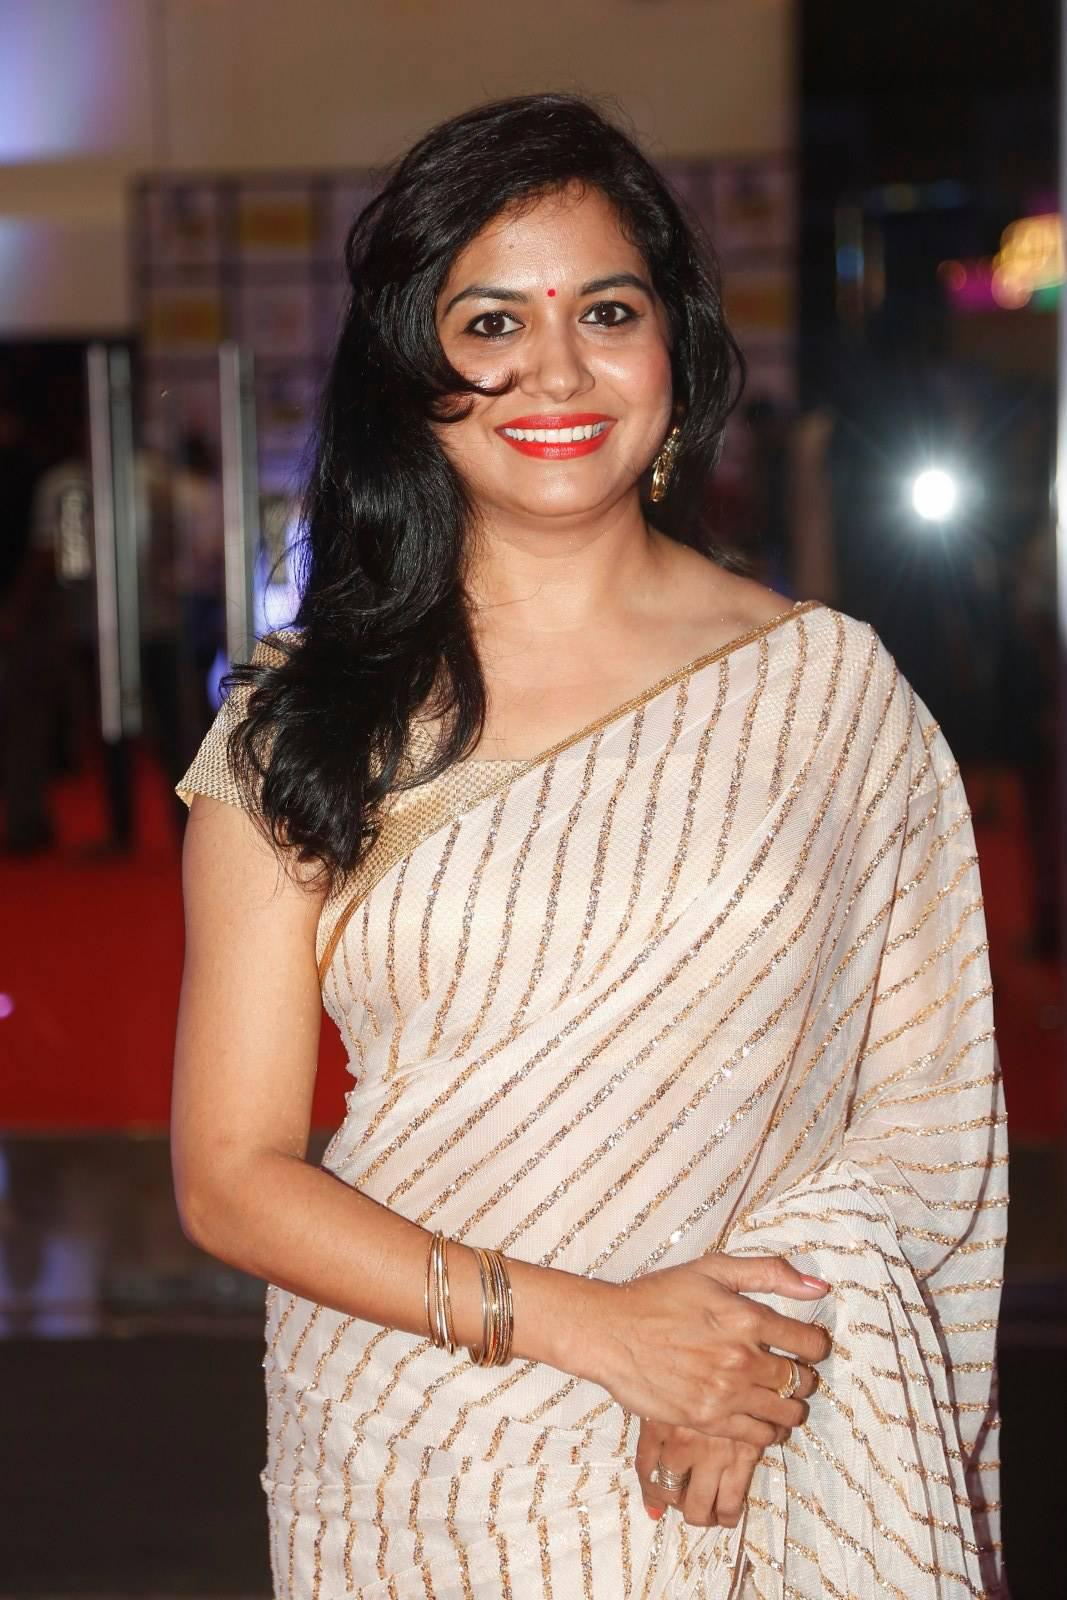 Beautiful Telugu Singer Sunitha Latest Stills In White Saree